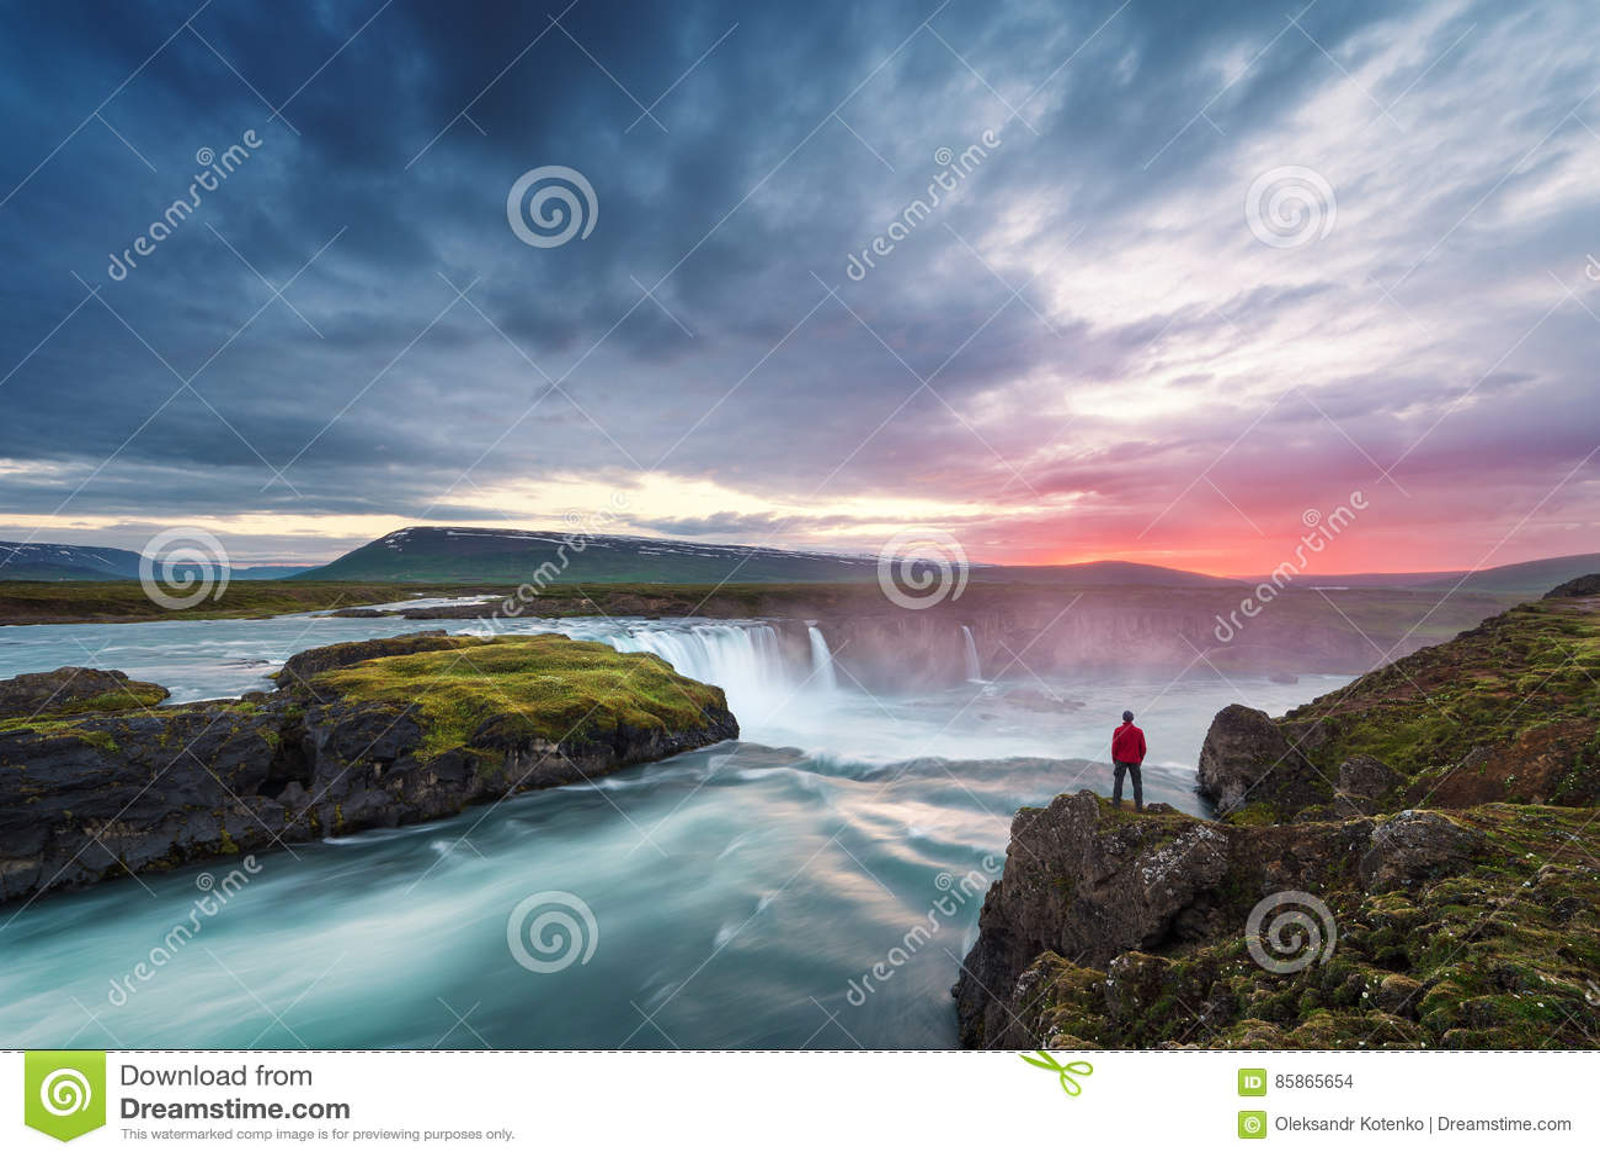 Ландшафт Исландии с водопадом Godafoss